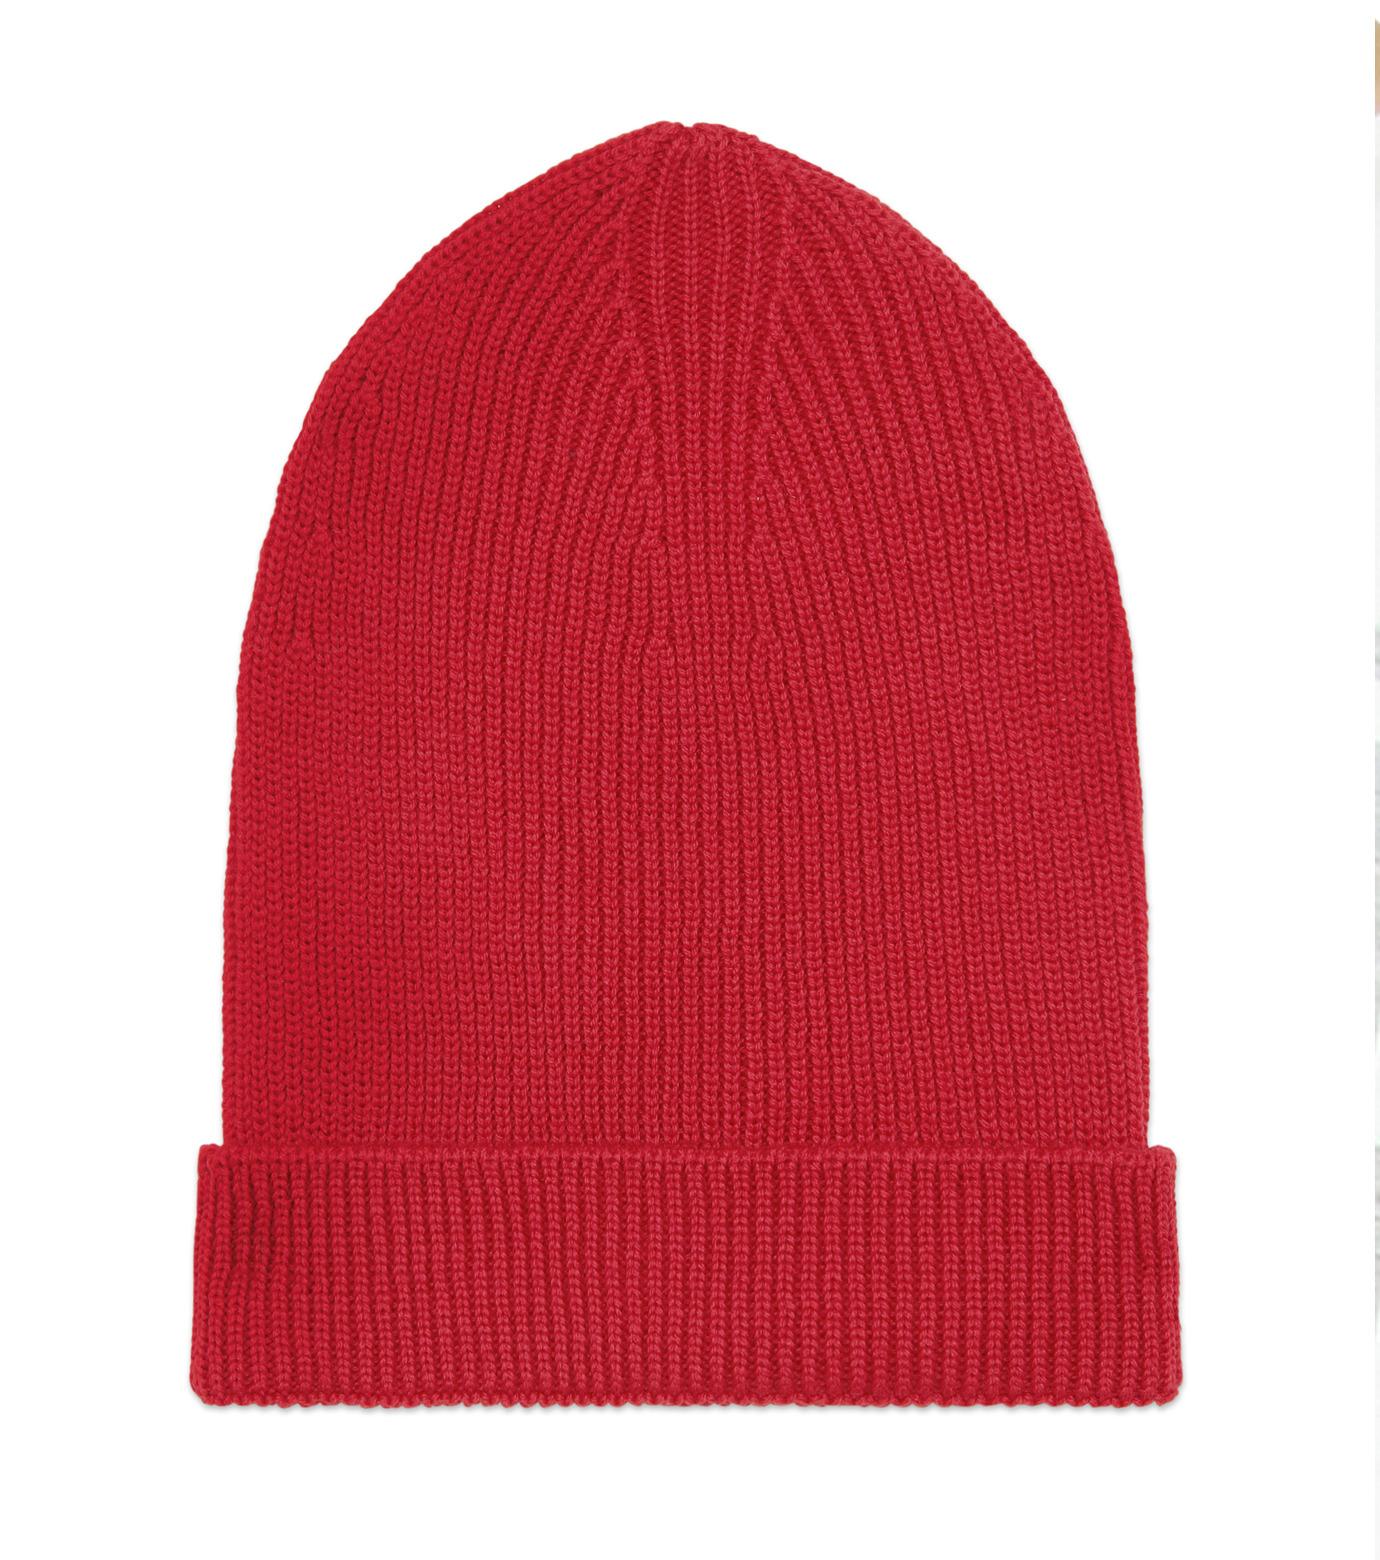 Ami(アミ)のKnit Cap-RED(アクセサリー/accessory)-E15K3102-62 拡大詳細画像1